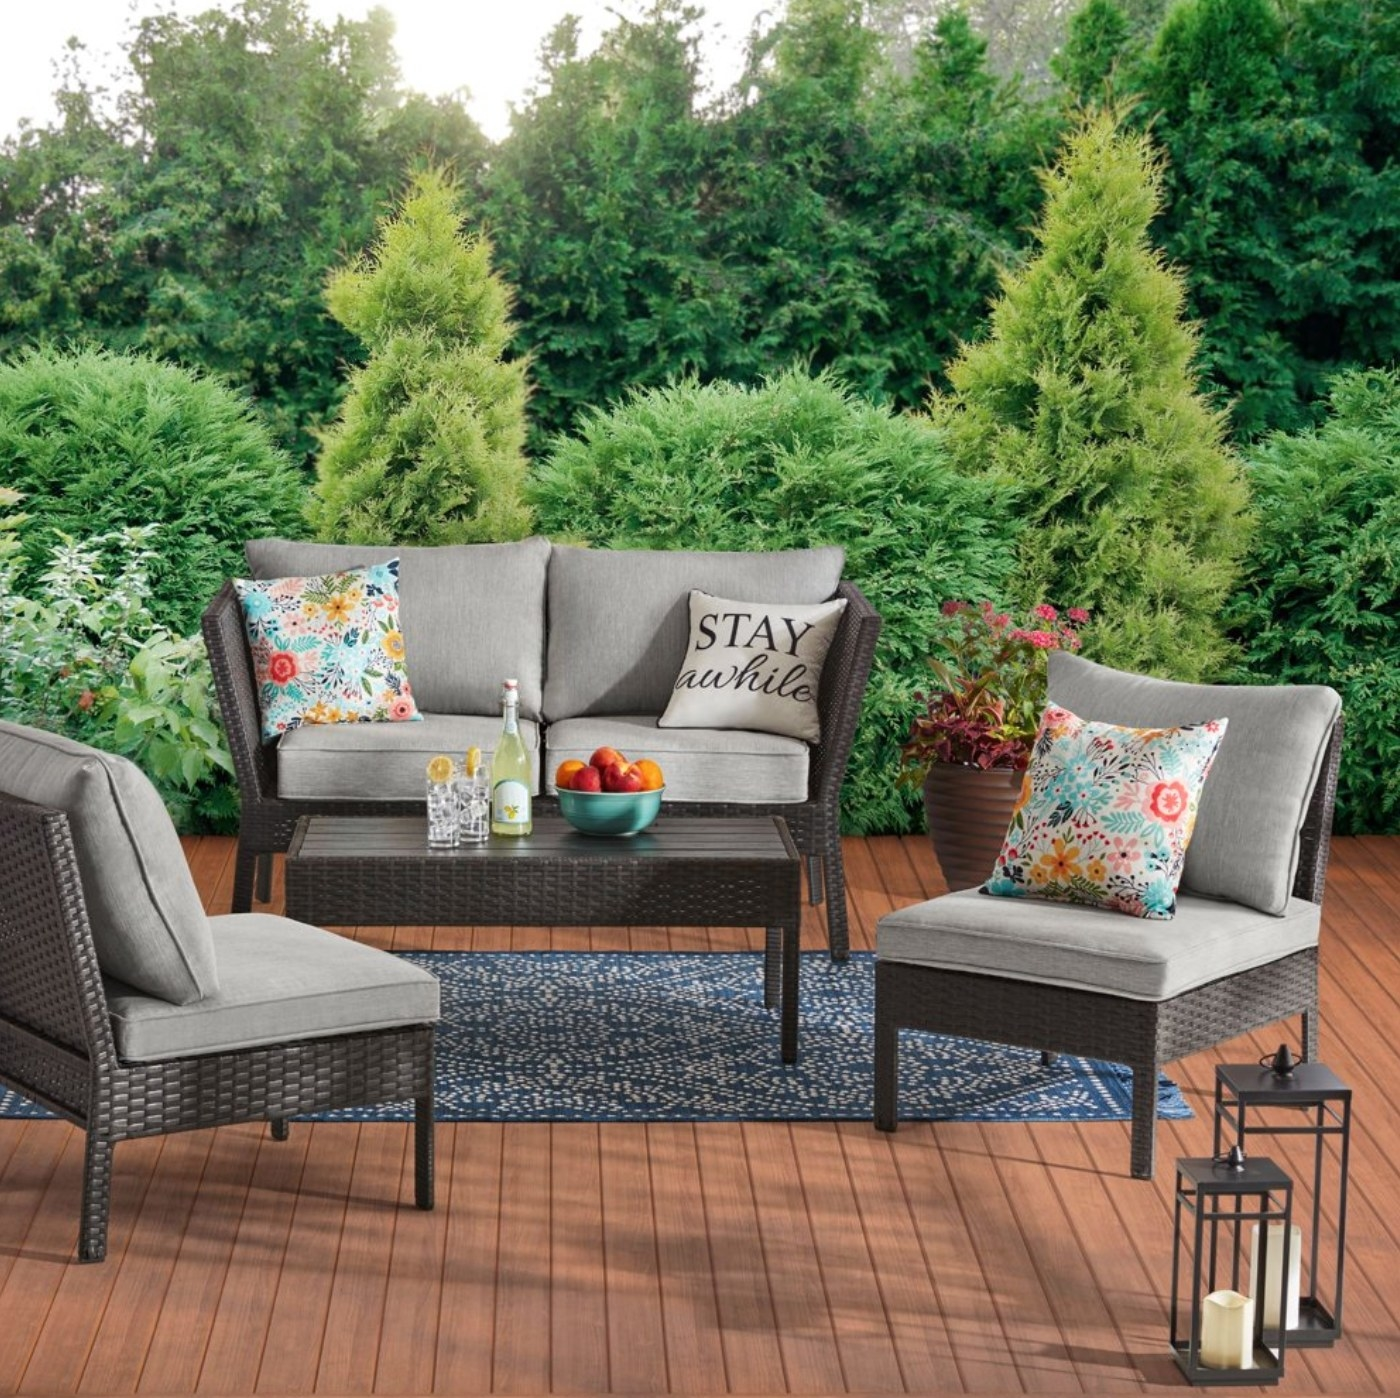 the four piece outdoor patio set